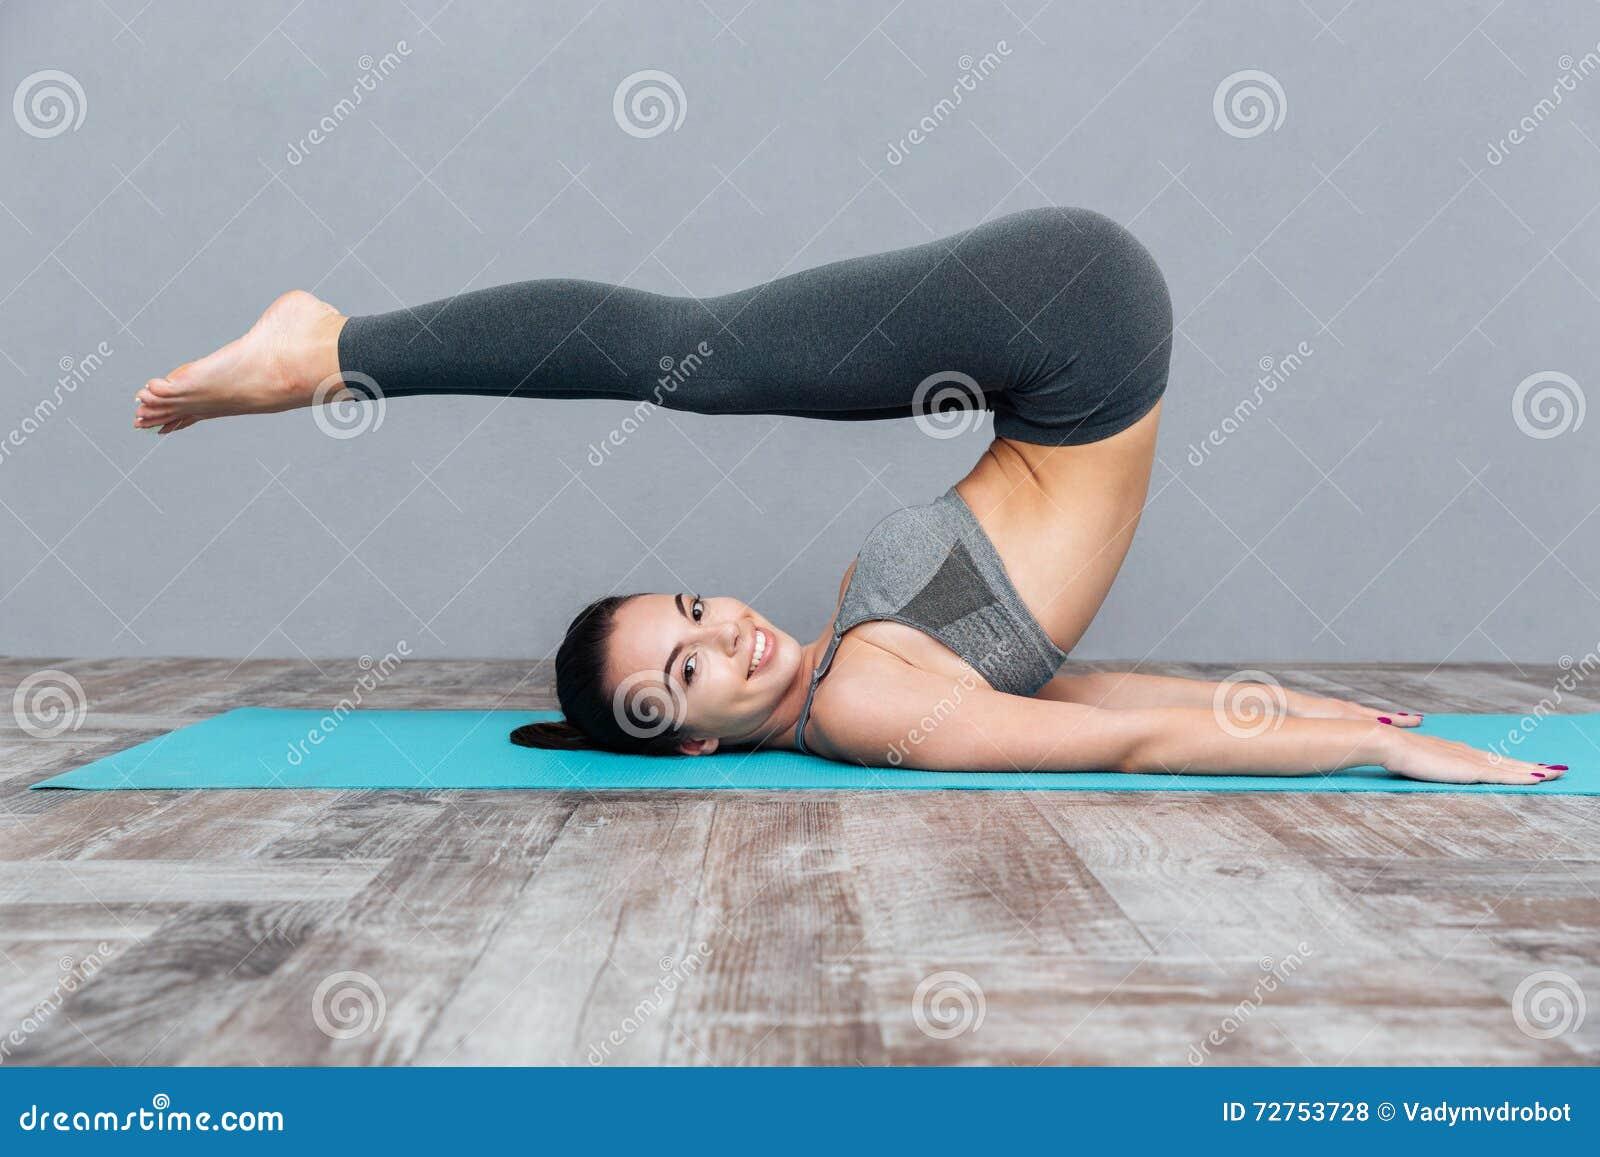 jeune fille faisant l 39 exercice halasana pose de yoga de charrue photo stock image du nu. Black Bedroom Furniture Sets. Home Design Ideas